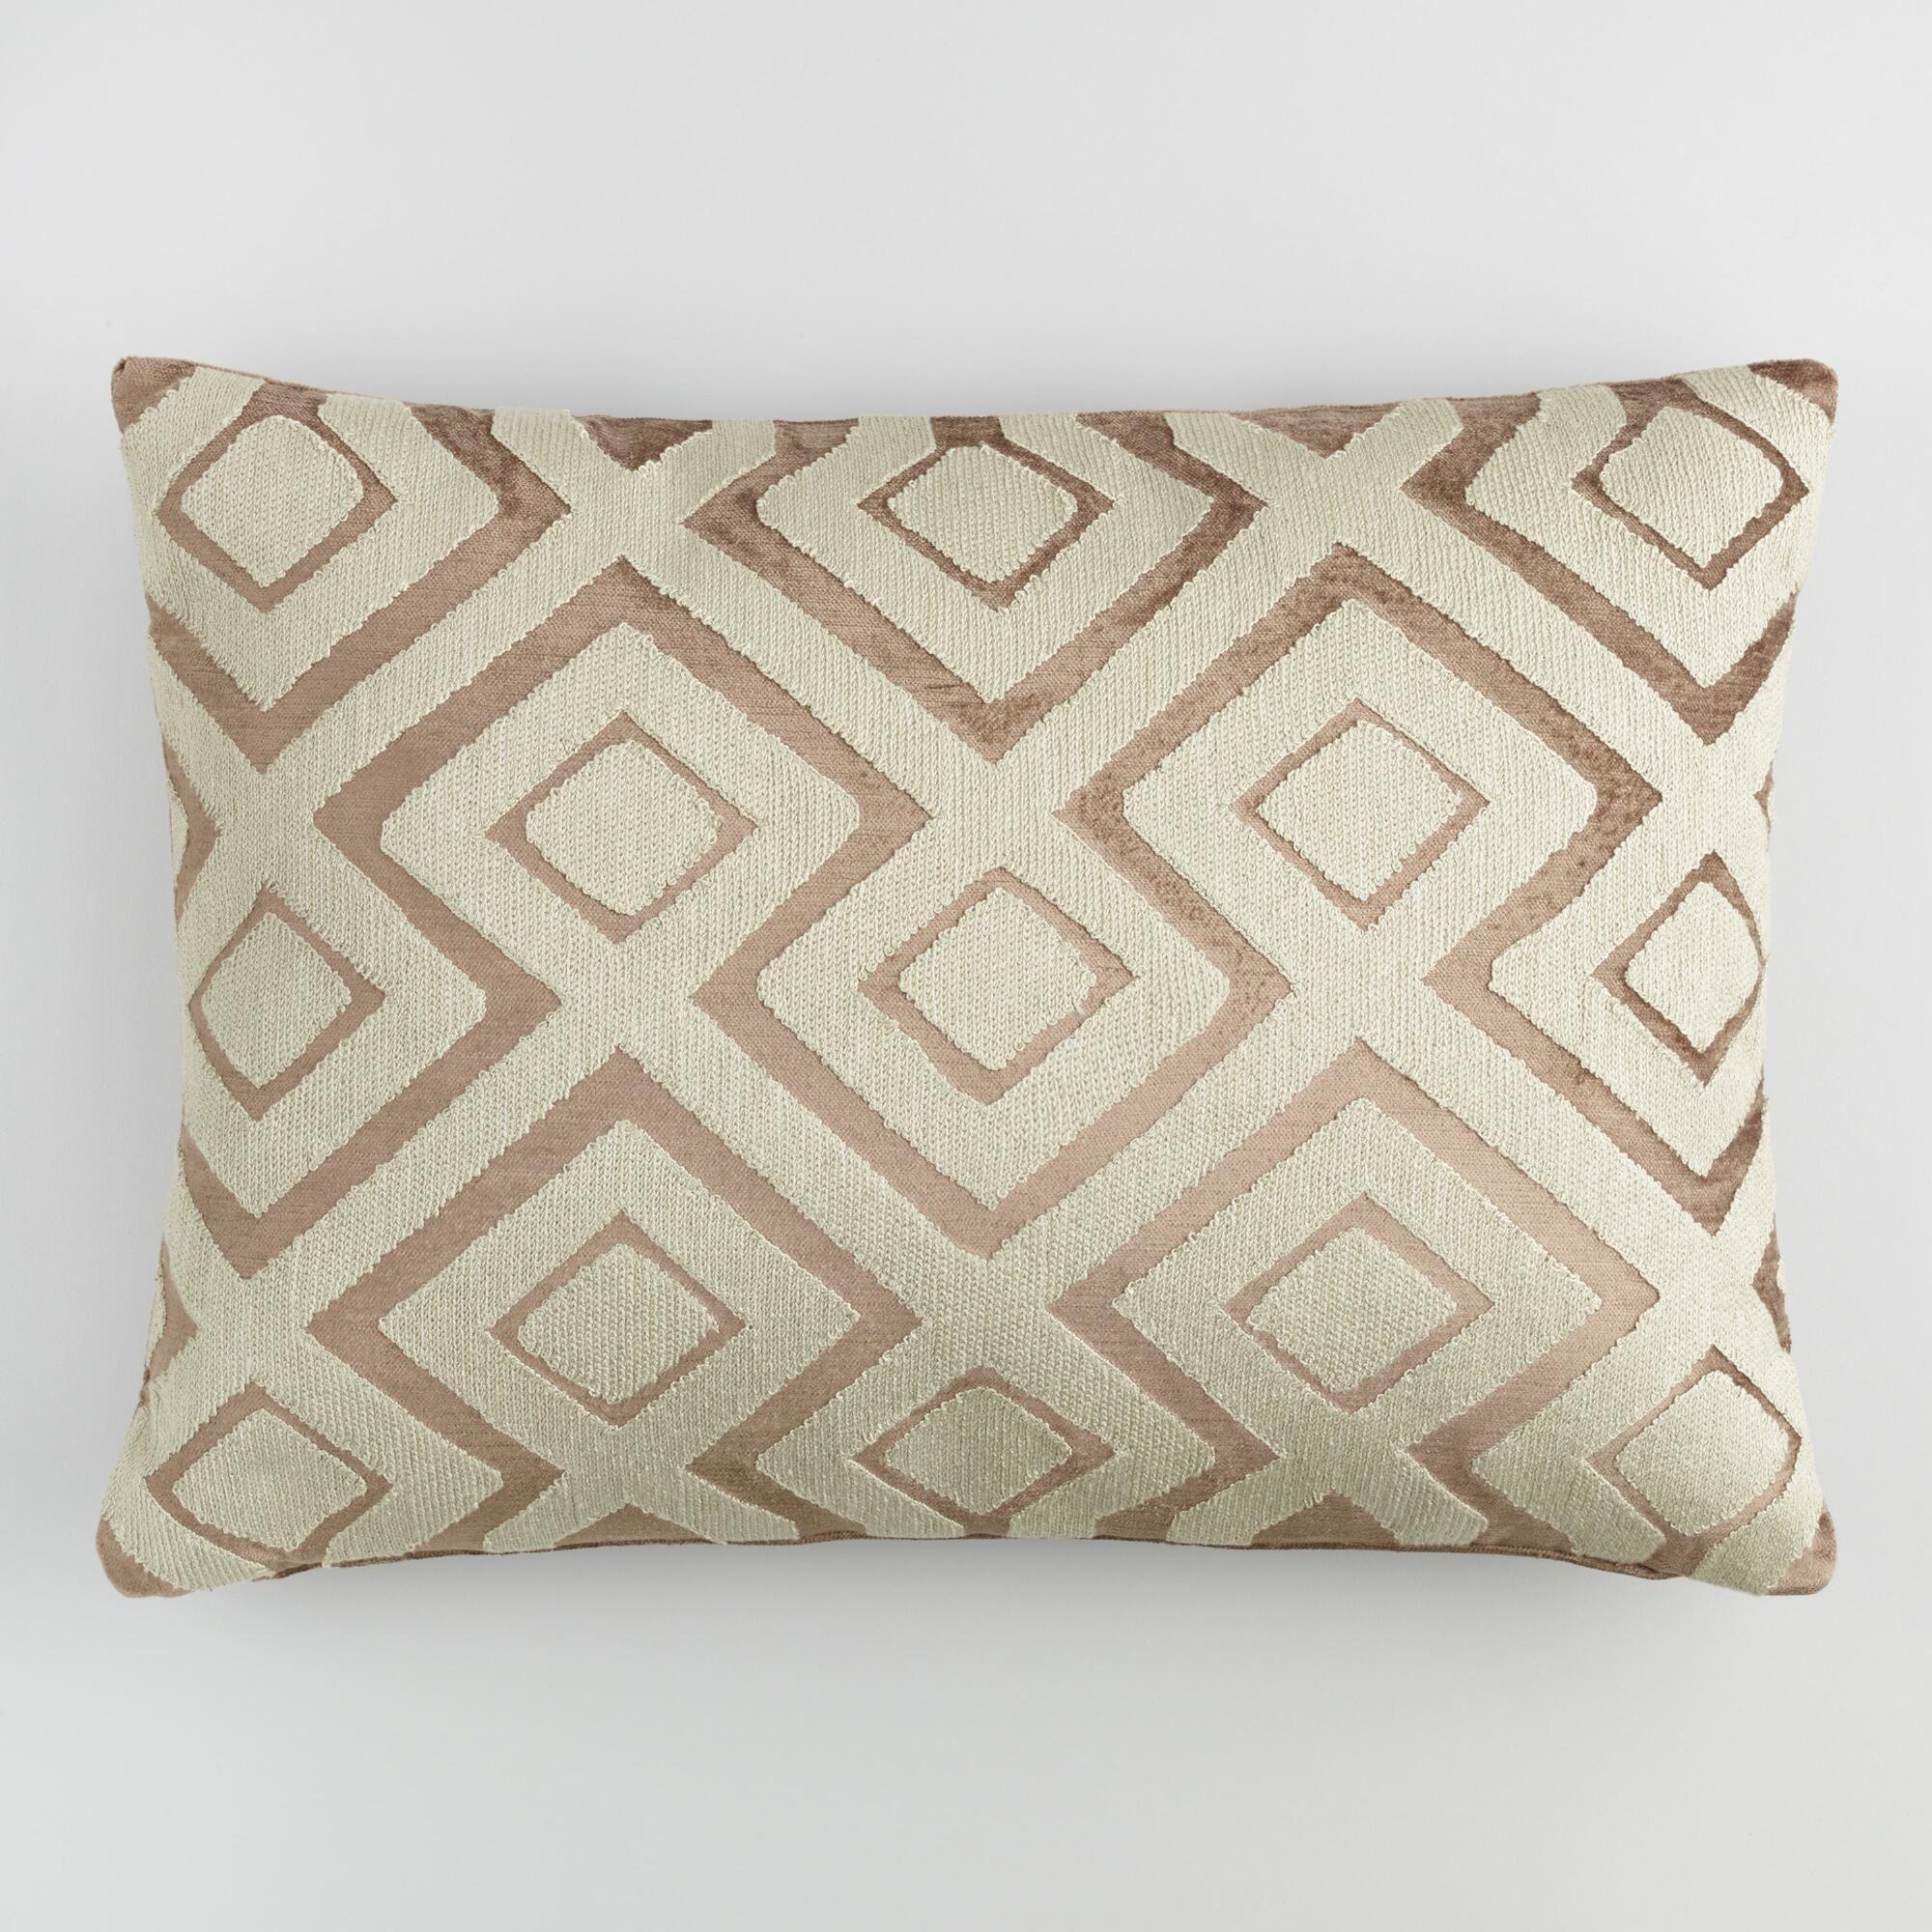 Copper Diamond Embroidered Velvet Lumbar Pillow: Brown by World Market